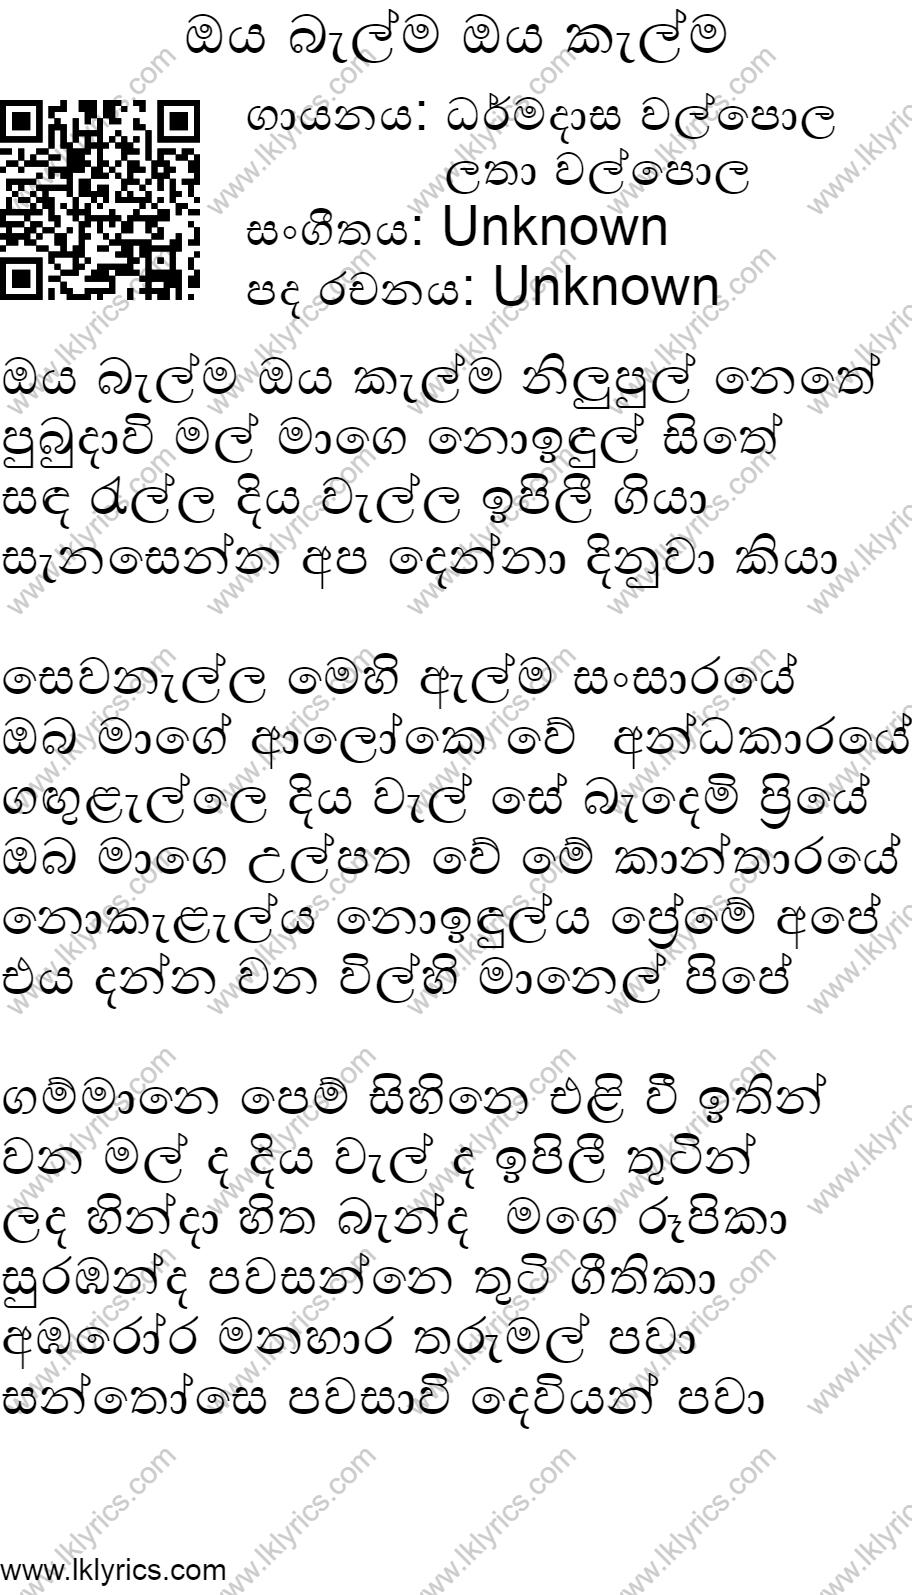 Sri lanaka nadee - 3 part 9